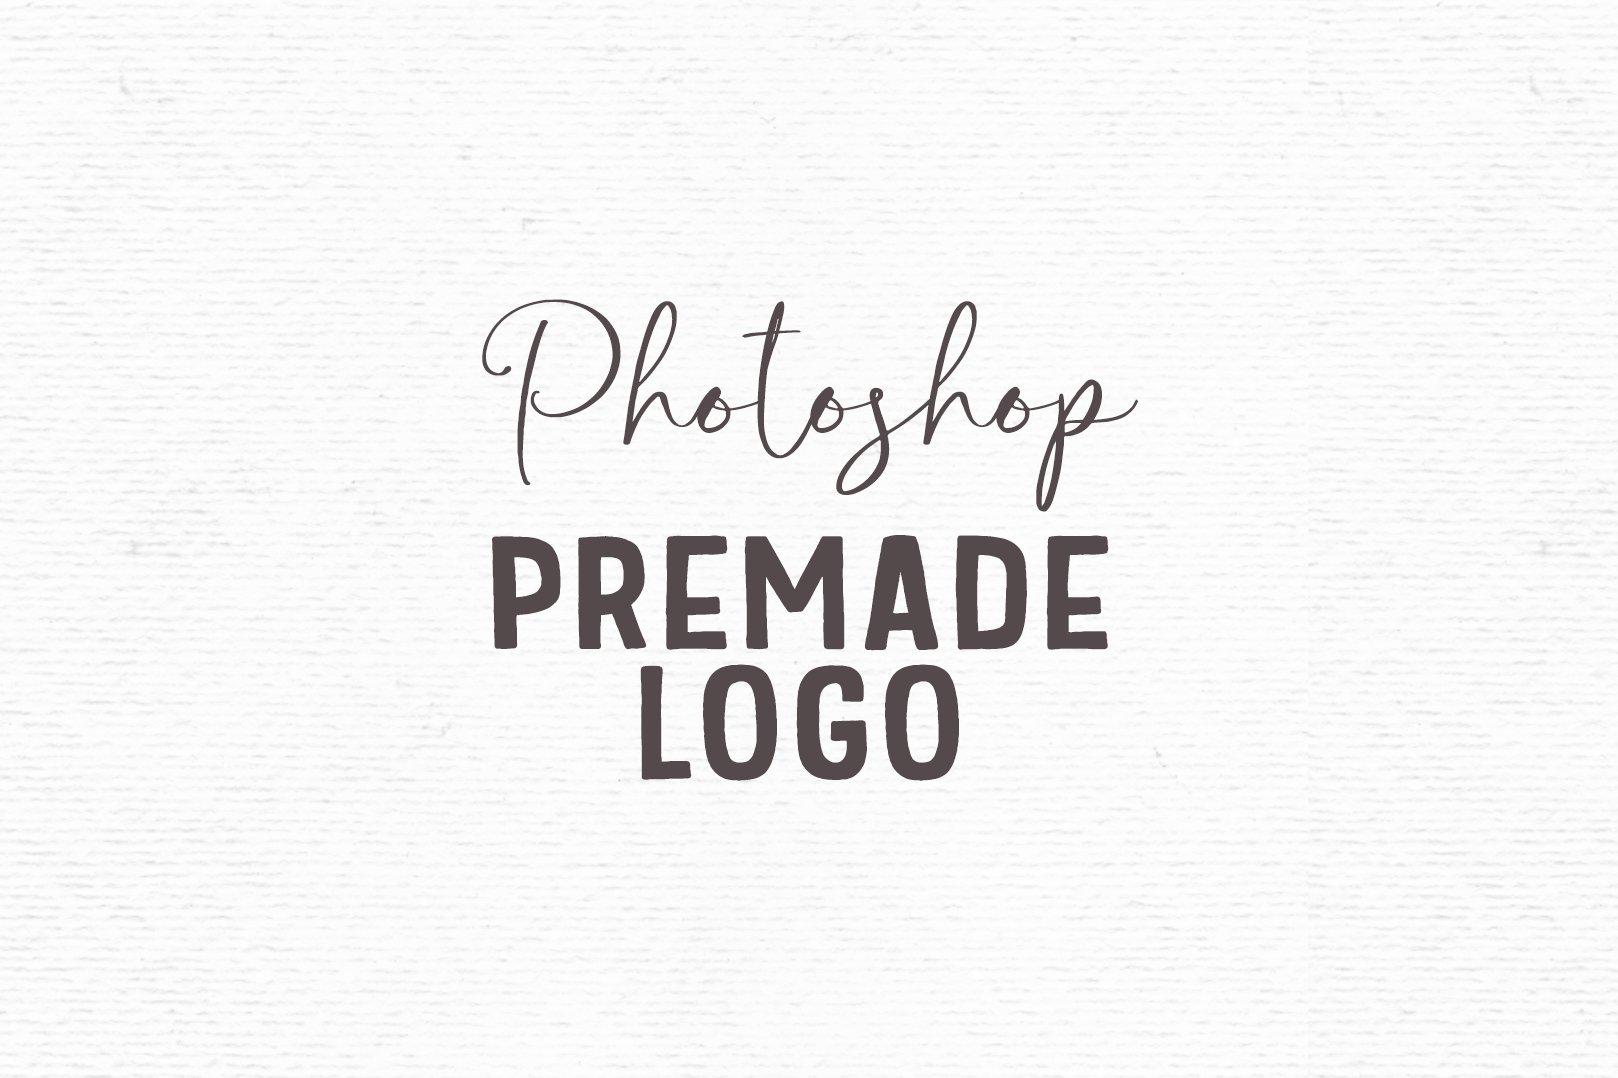 Premade logo design template for Photoshop | Flower logo example image 5